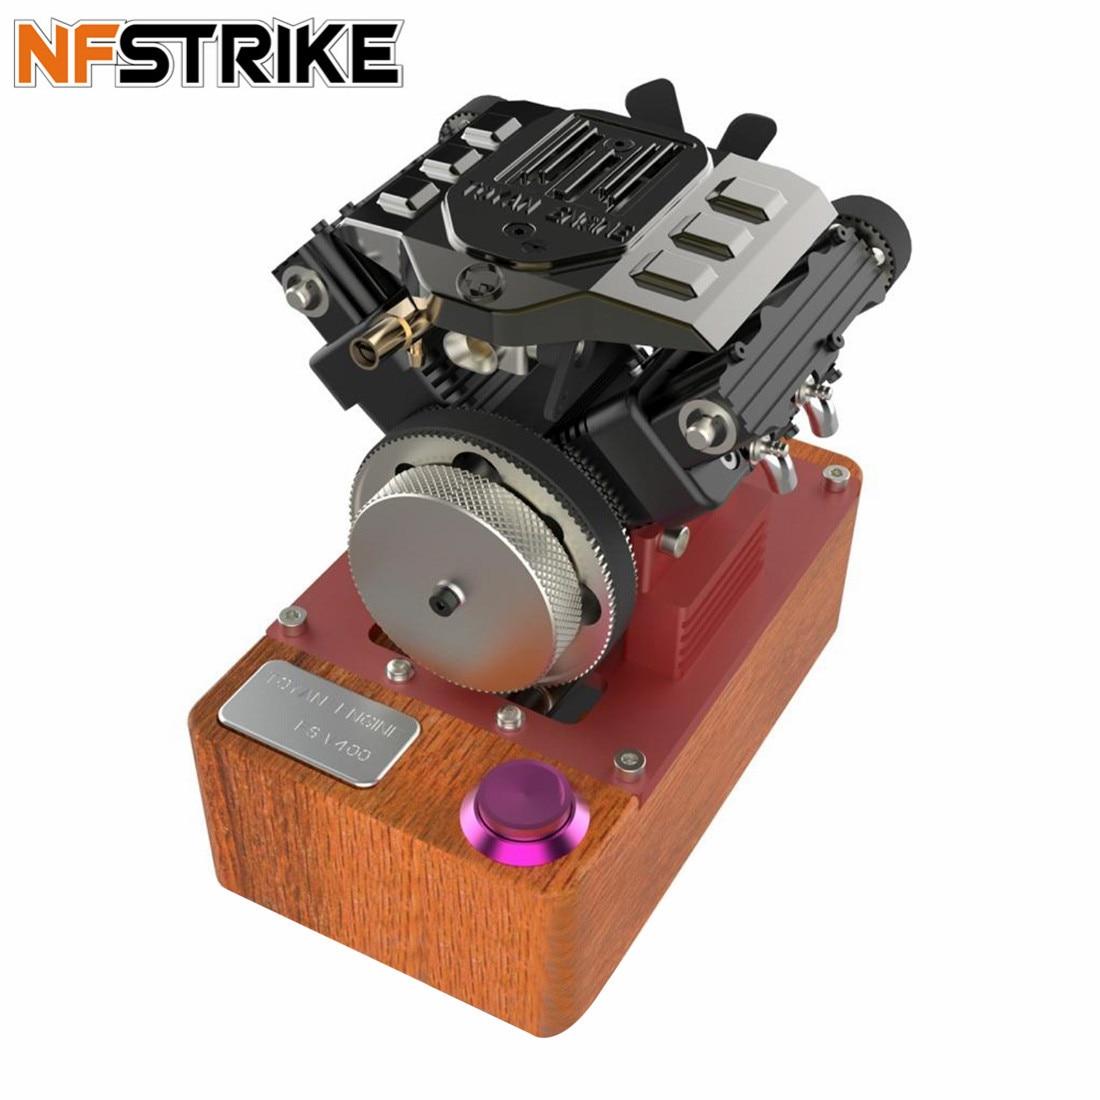 Original TOYAN  ENGINE FS-S100WA Water-cooled Four-stroke Gasoline Model Engine